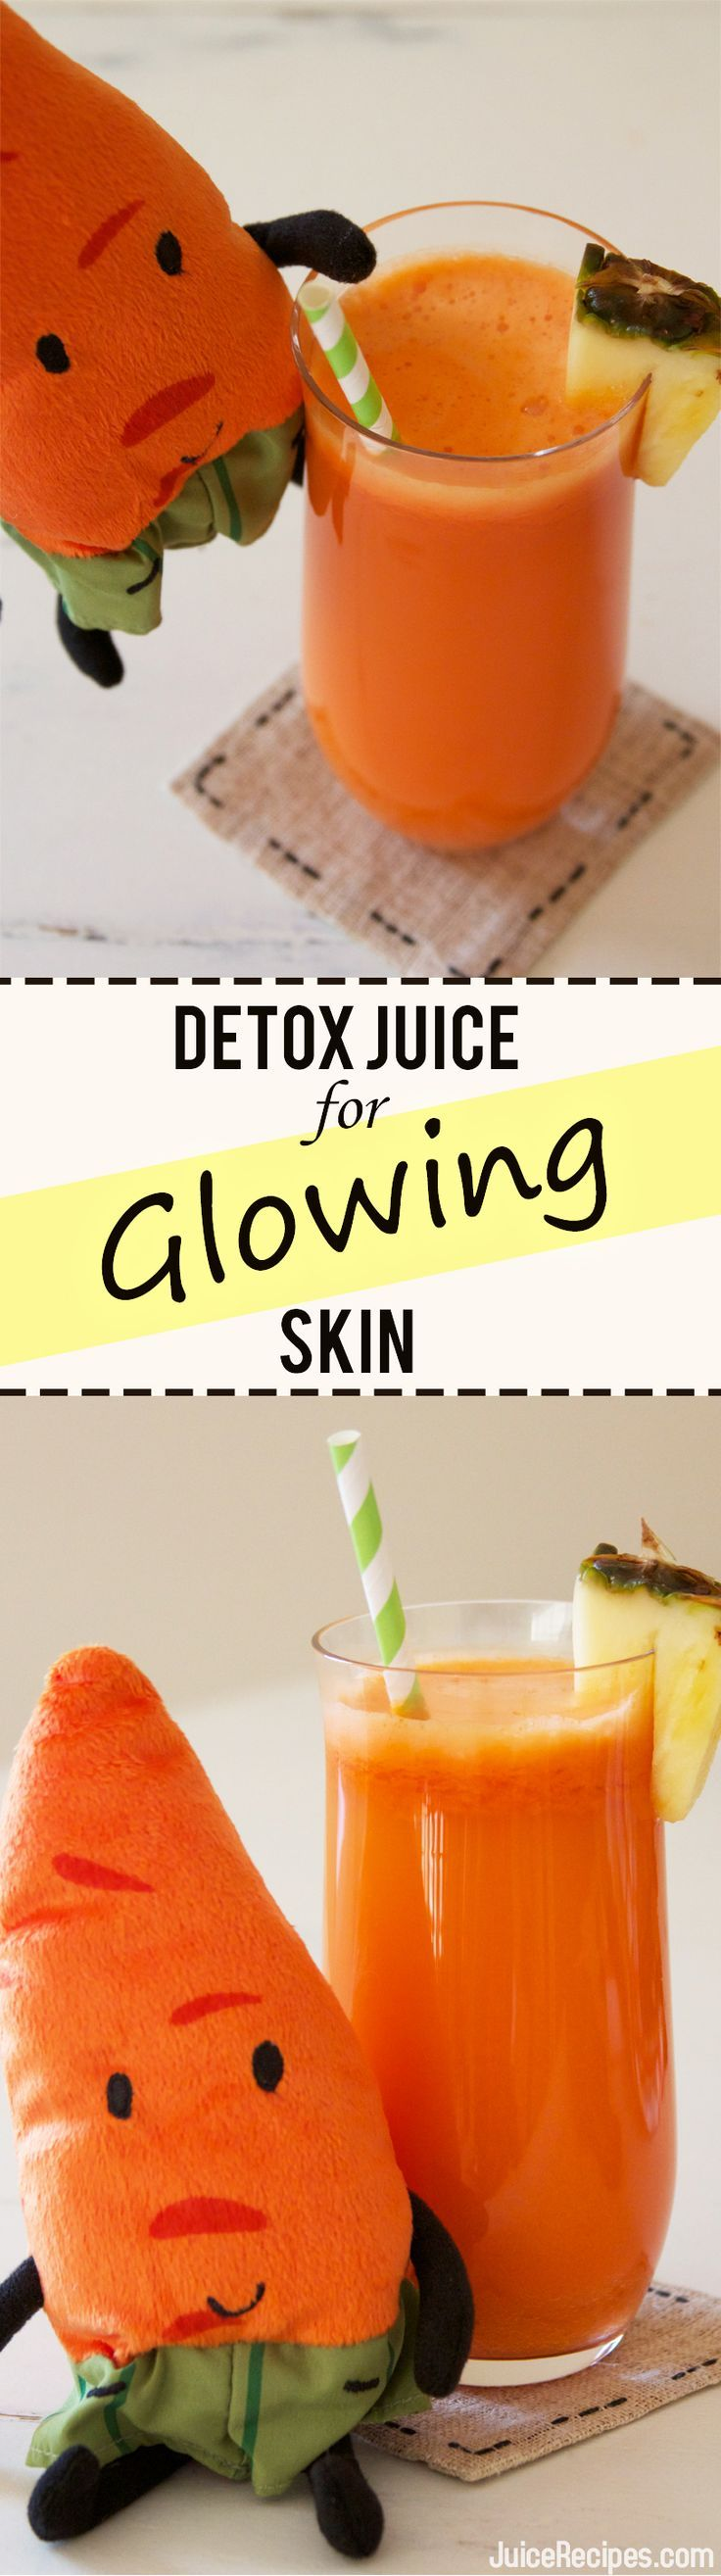 Sweet Satin Detox Juice for beautiful glowing skin #naturalskincare #healthyskin #skincareproducts #Australianskincare #AqiskinCare #SkinFresh #australianmade #australianmadecampaign